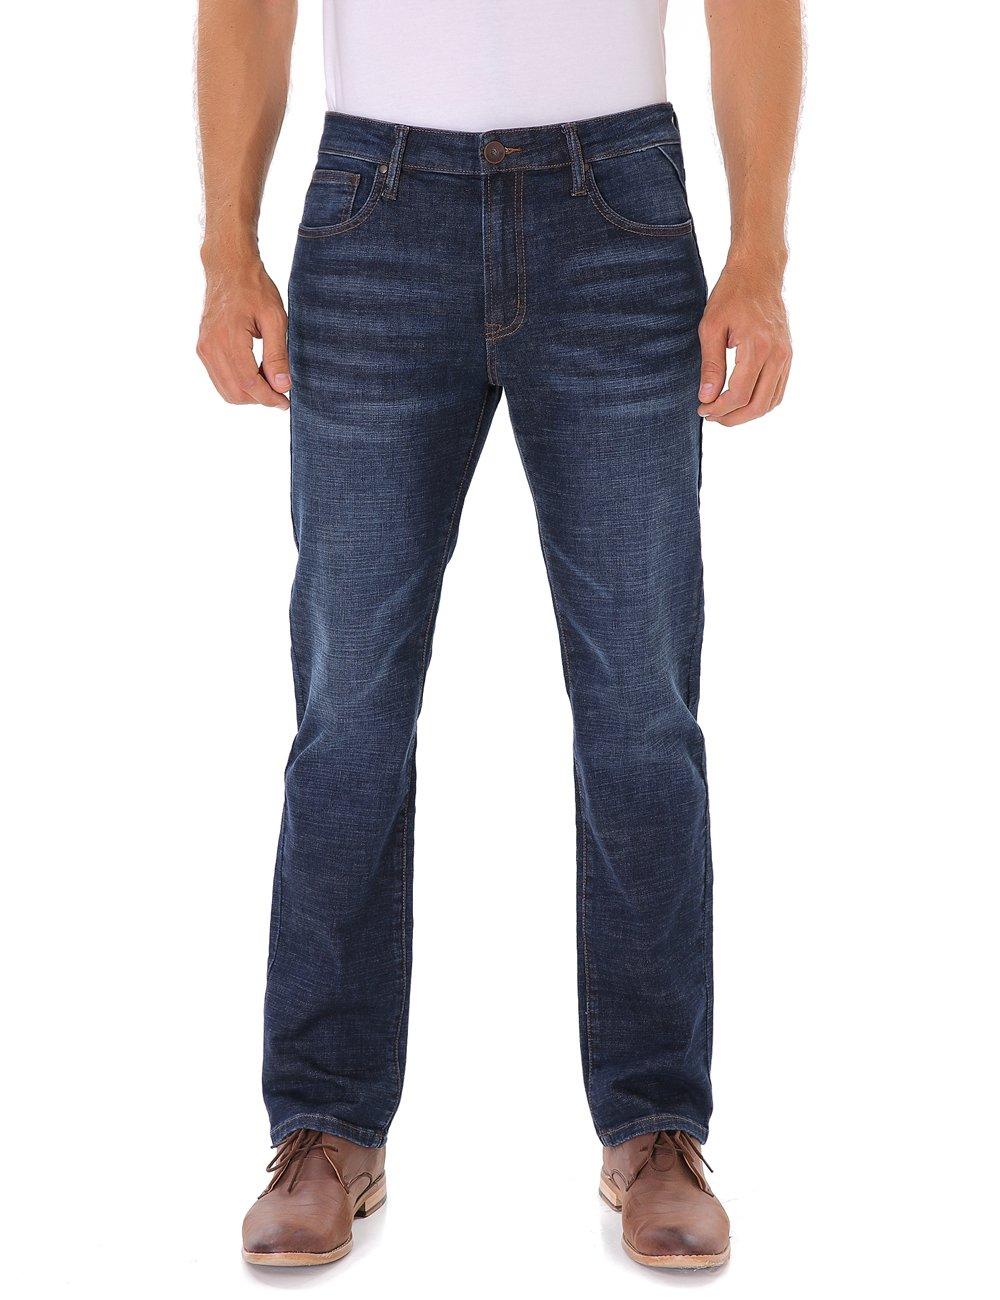 Indigo alpha Men's Stretch Slim-Fit Straight Jeans Summer,Blue,36W x 32L